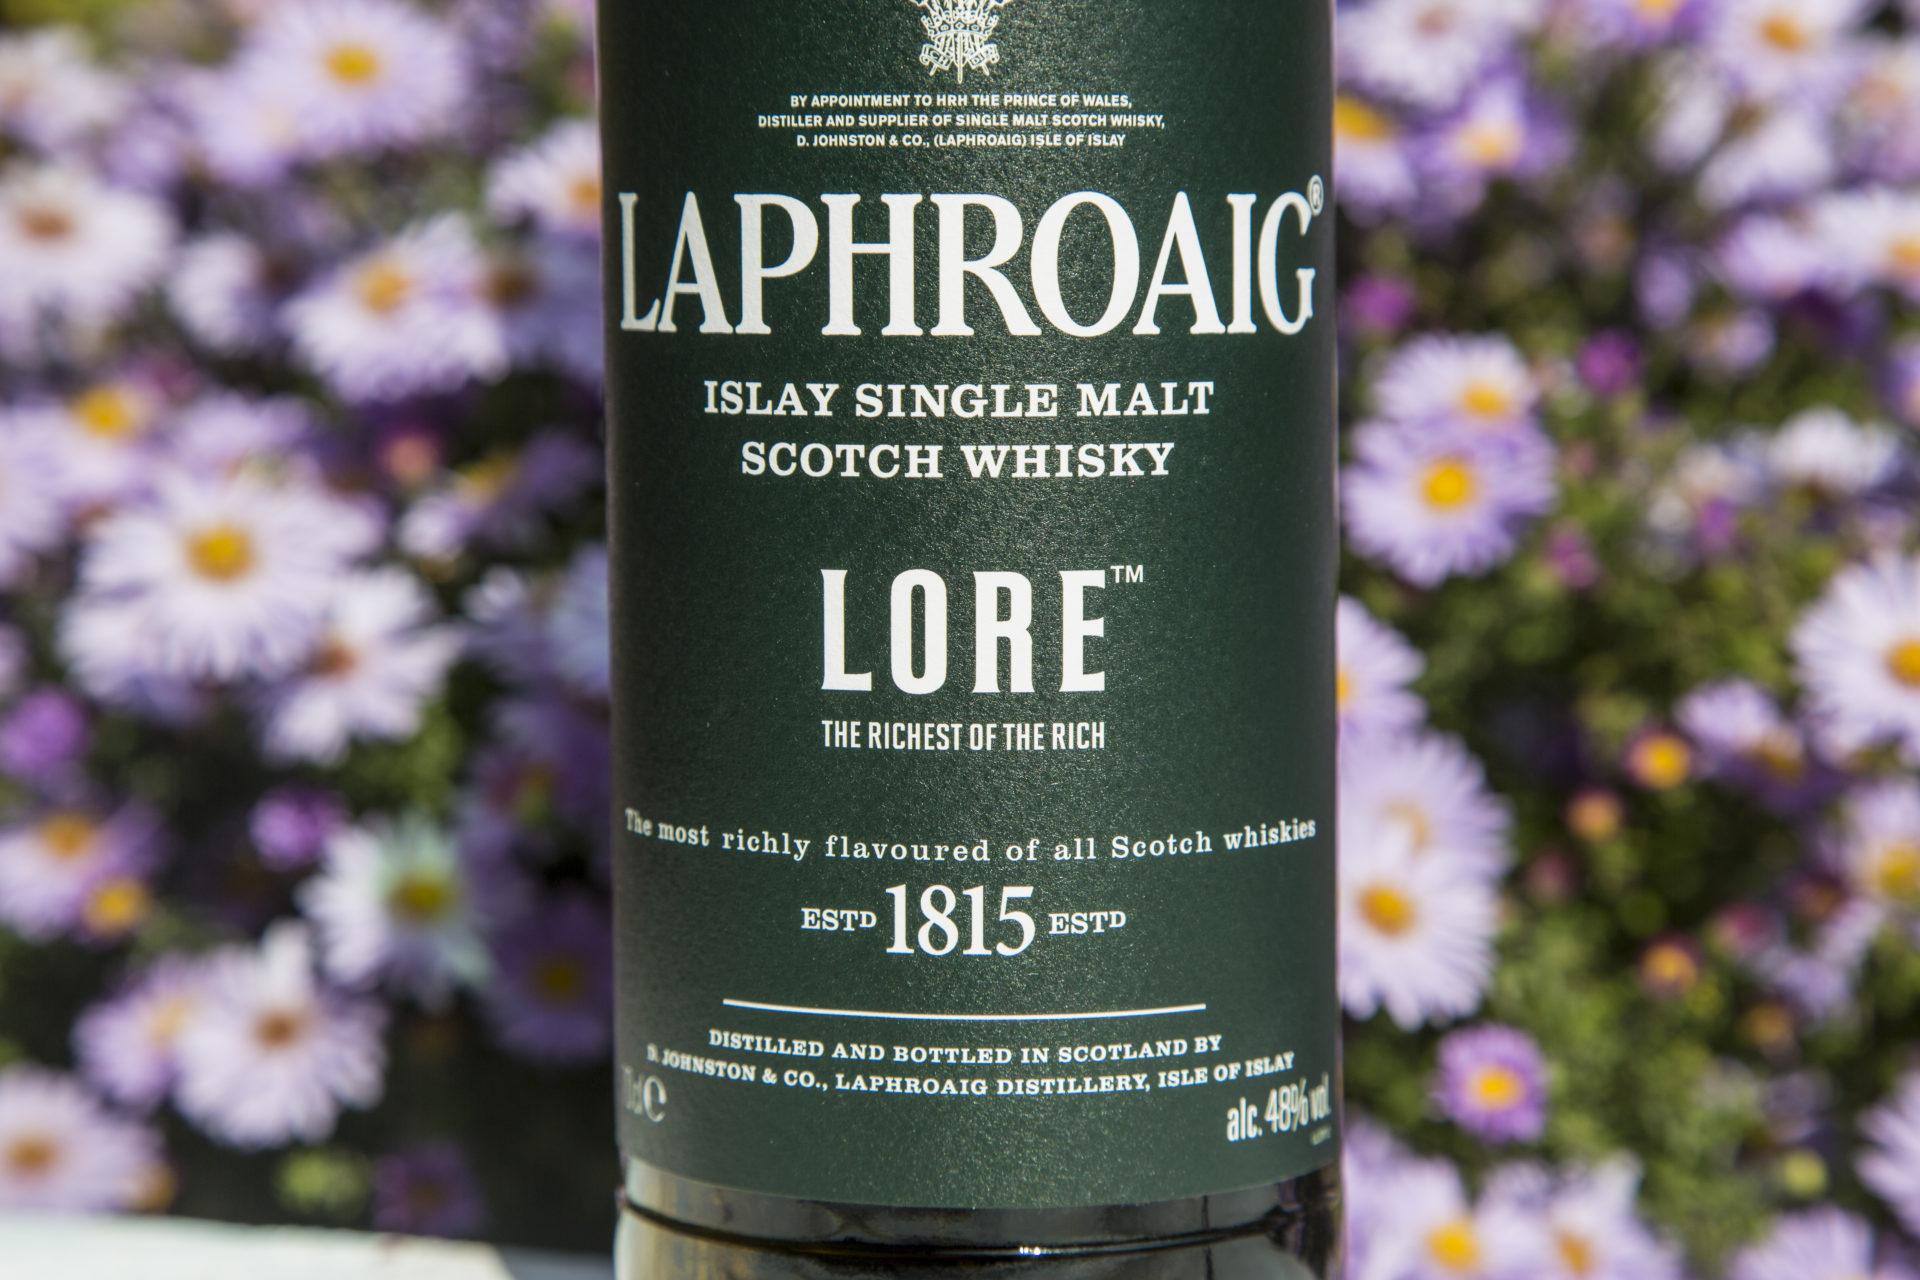 Nasza recenzja Laphroaig Lore #2